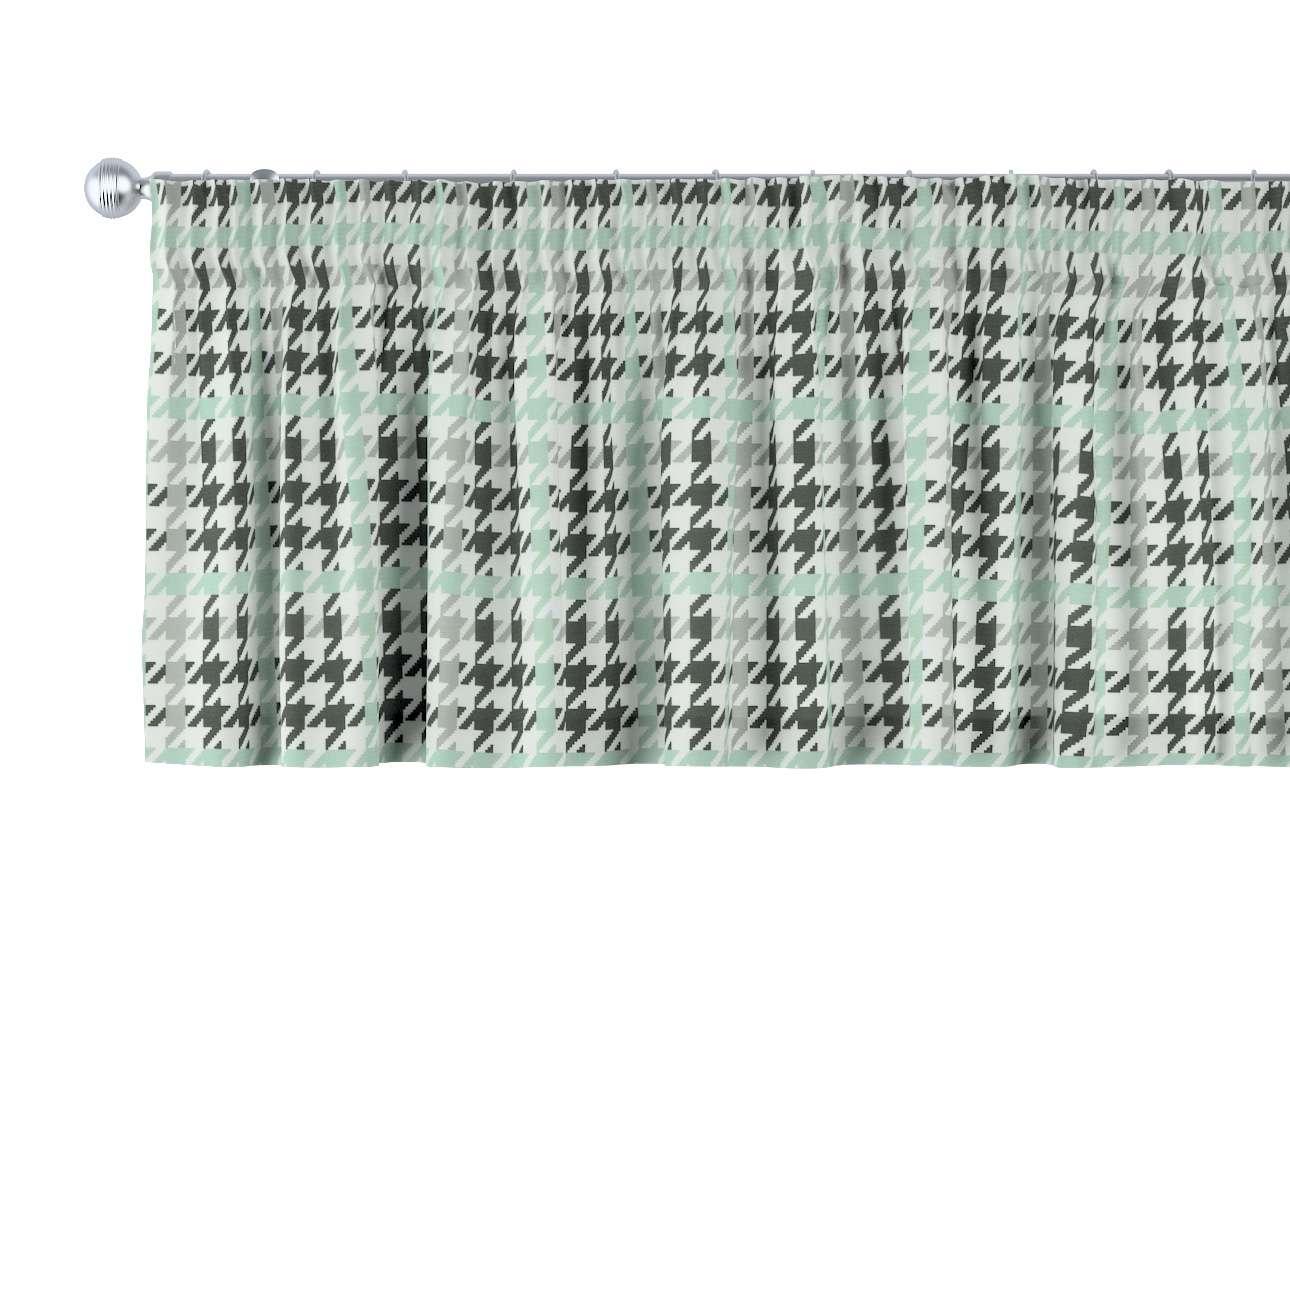 Kurzgardine mit Kräuselband 130 x 40 cm von der Kollektion Brooklyn, Stoff: 137-77